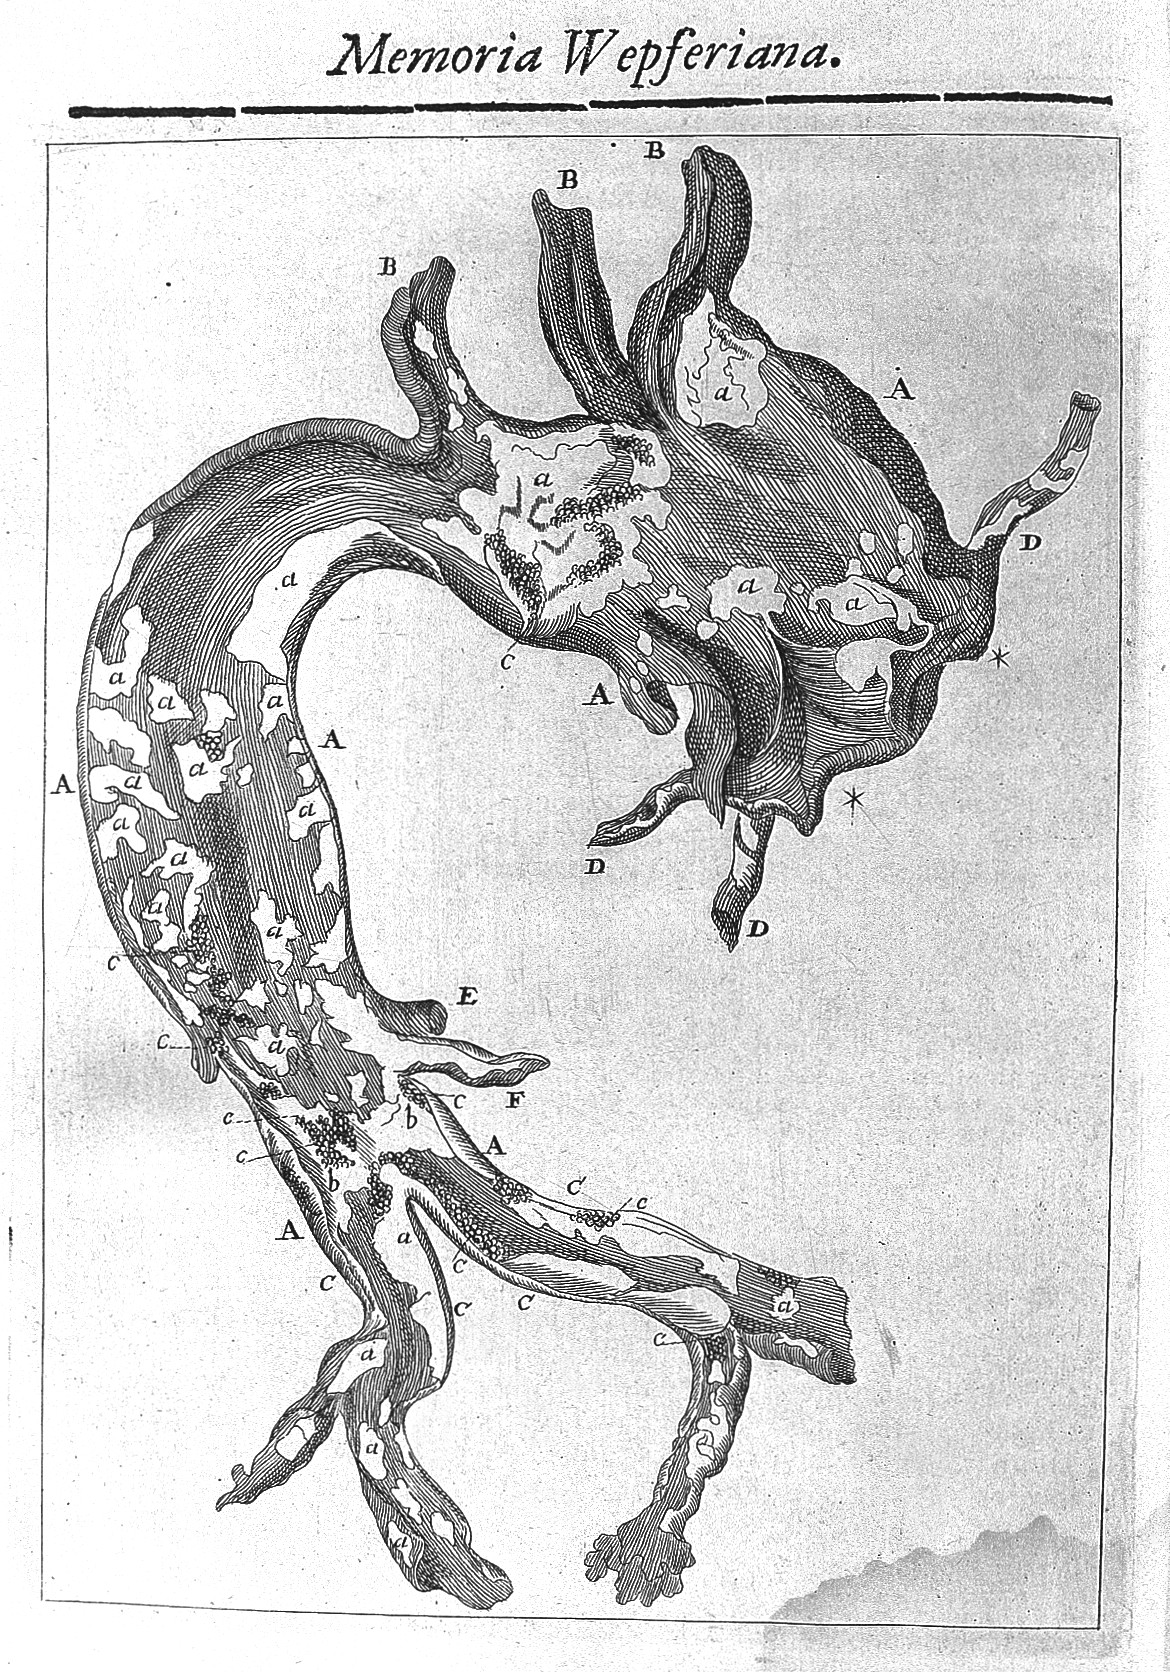 FichierThe aorta; J.J. Wepfer, 40 Wellcome L40.jpg — Wikipédia